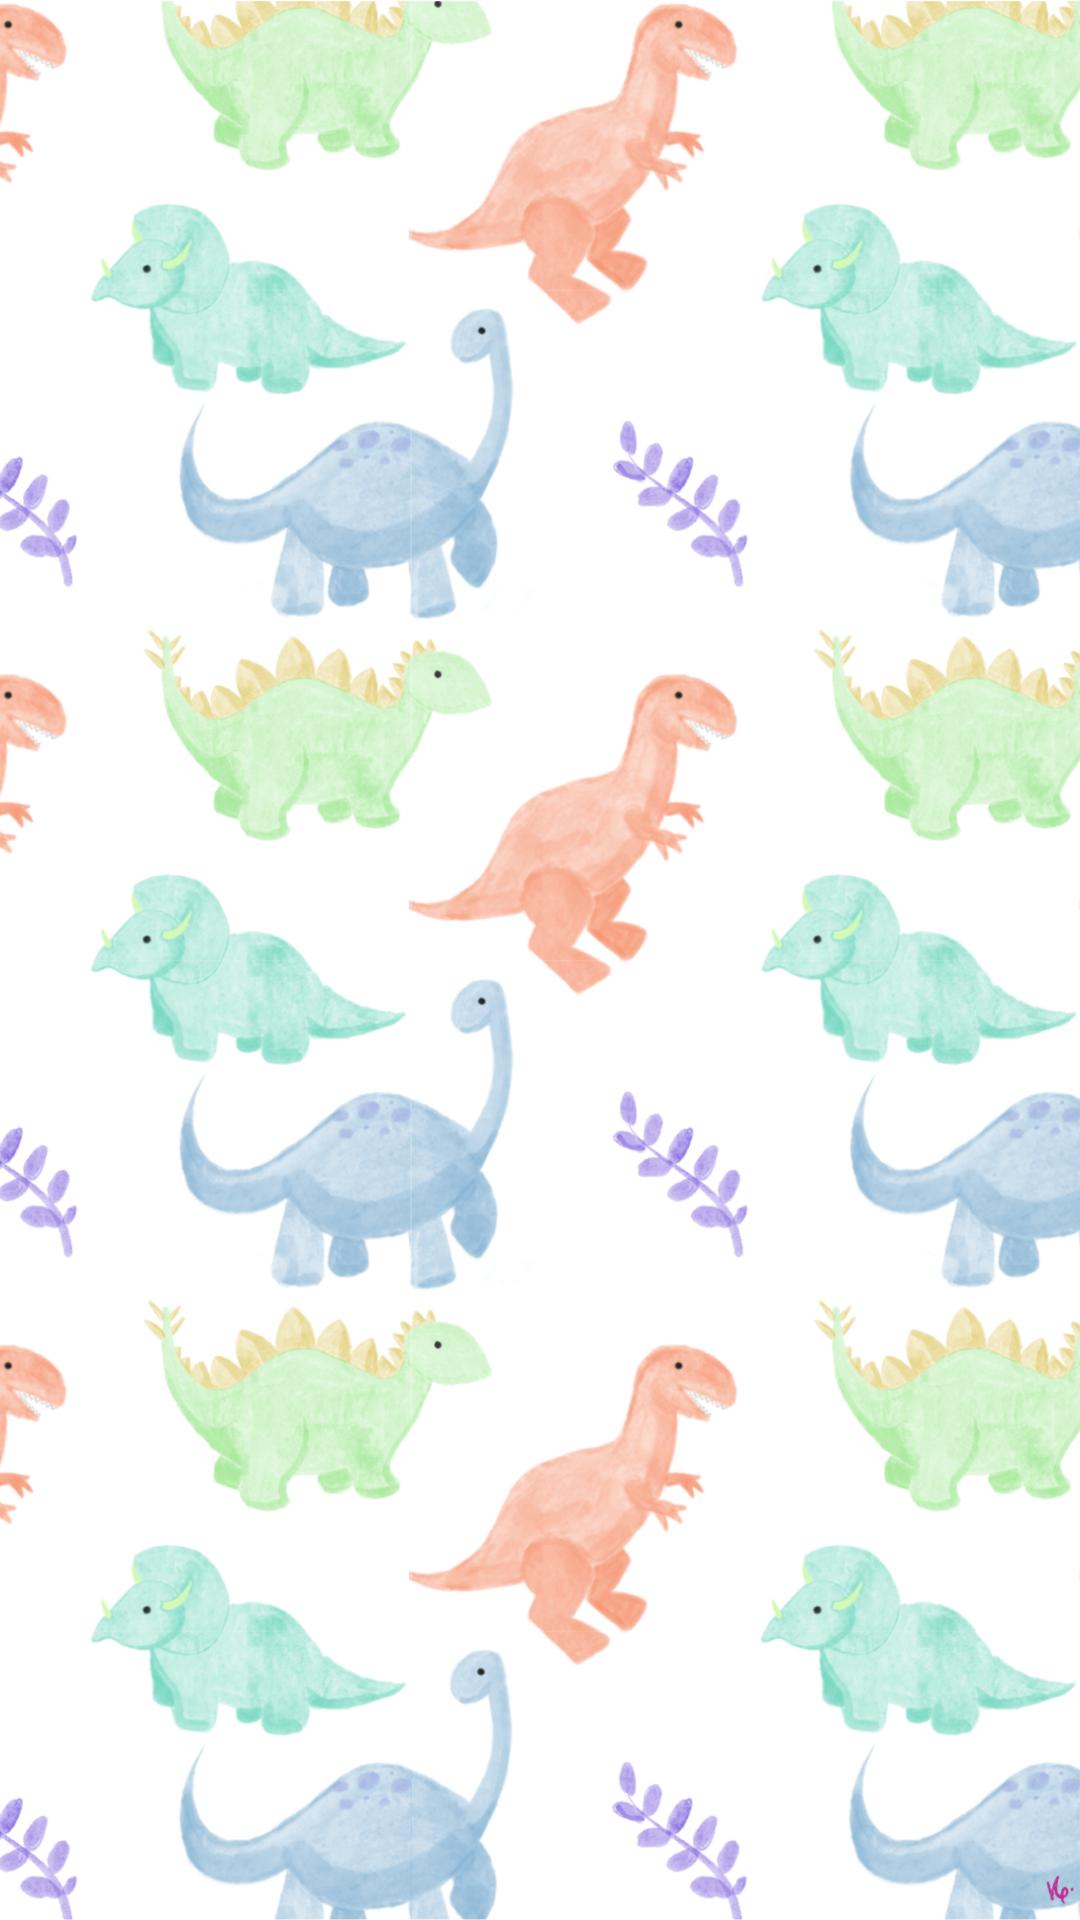 Watercolor Dino Wallpaper Dinosaur Background Iphone Wallpaper Photography Dinosaur Wallpaper